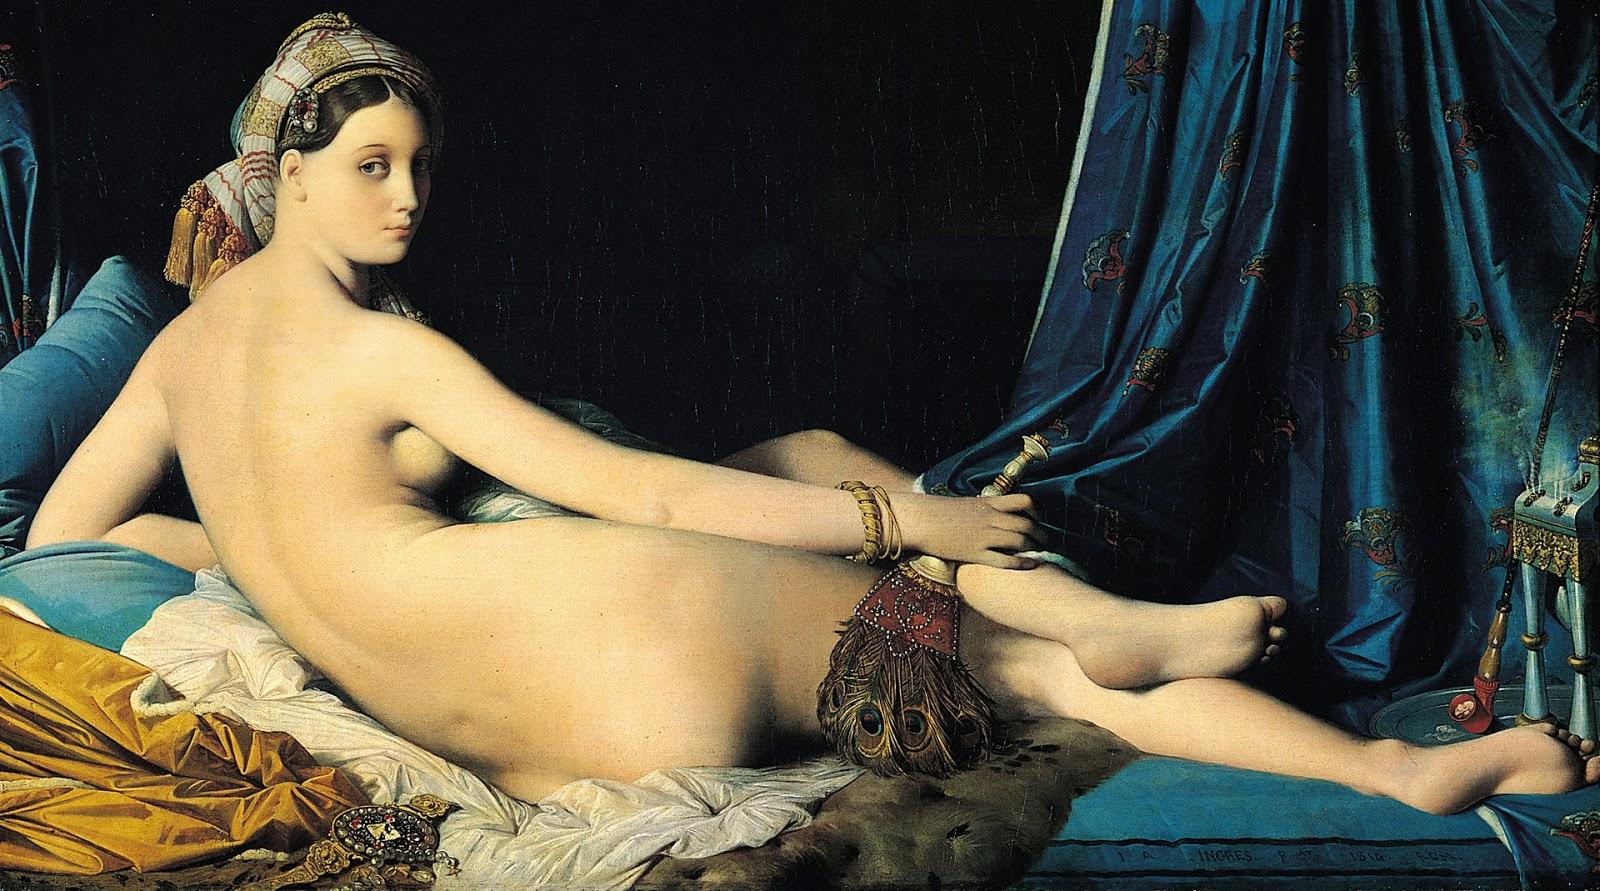 http://2.bp.blogspot.com/-6lEhOTbBP-o/U8qdnOHyP2I/AAAAAAAAAbo/DlCnMEIk4f8/s1600/Jean_Auguste_Dominique_Ingres,_La_Grande_Odalisque,_1814.jpg